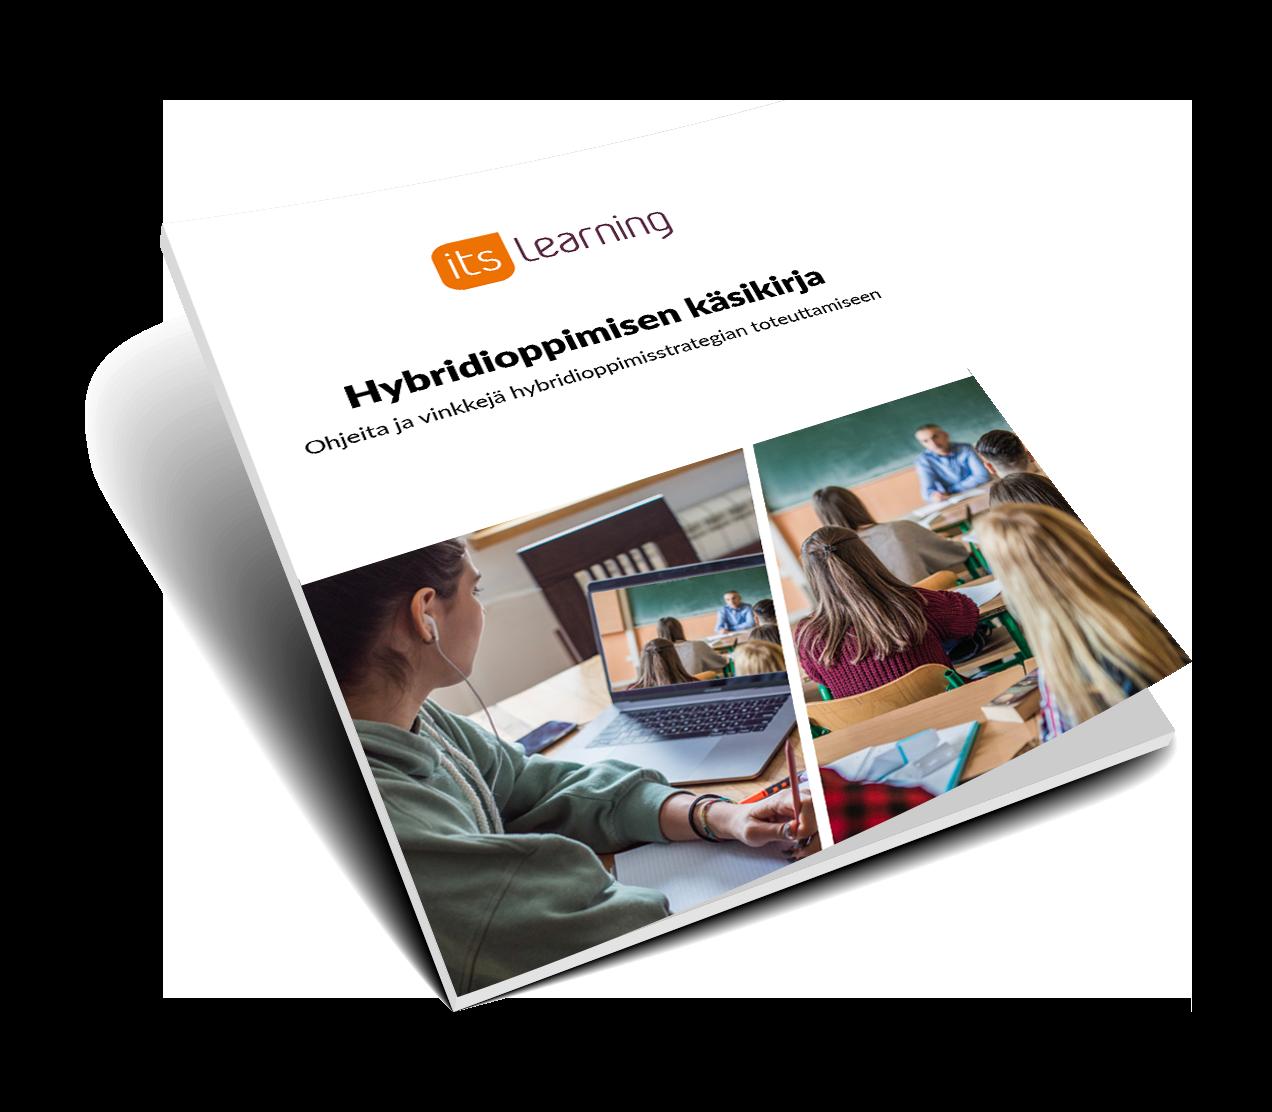 hybrid-learning-handbook-promo-fin-1